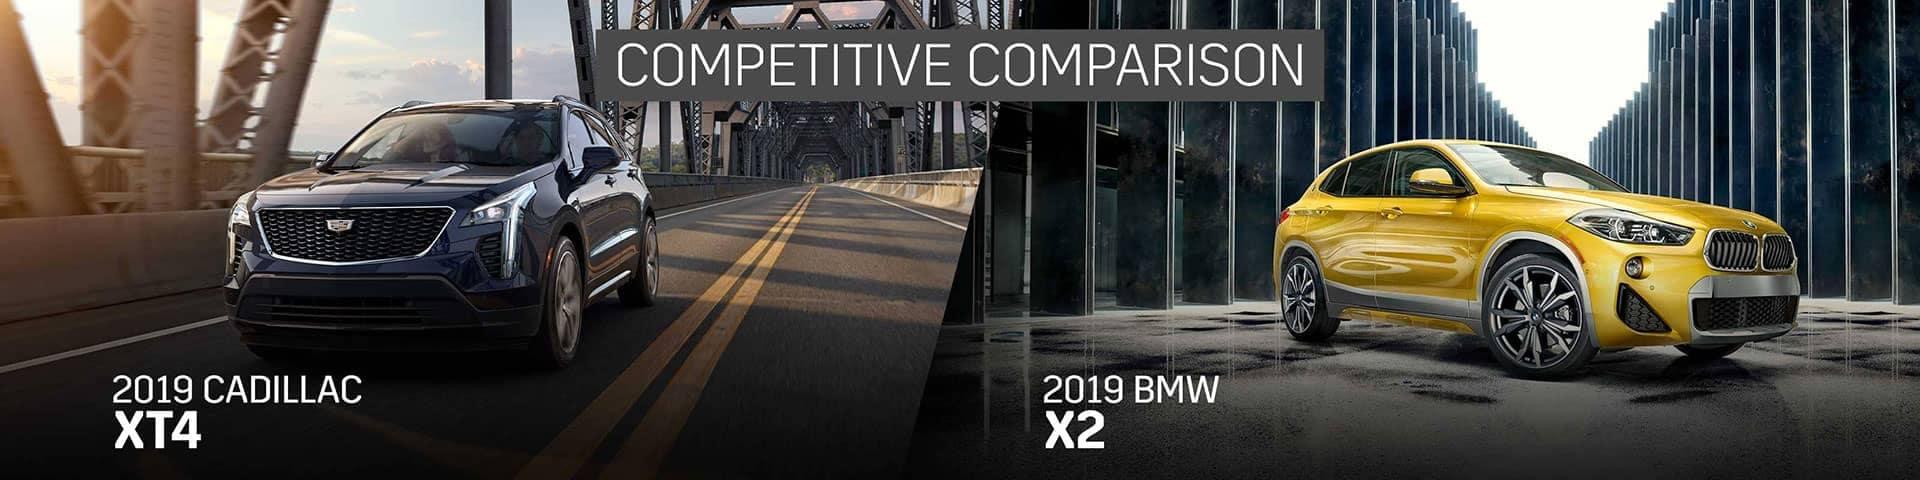 3-compare-2019-cadillac-xt4